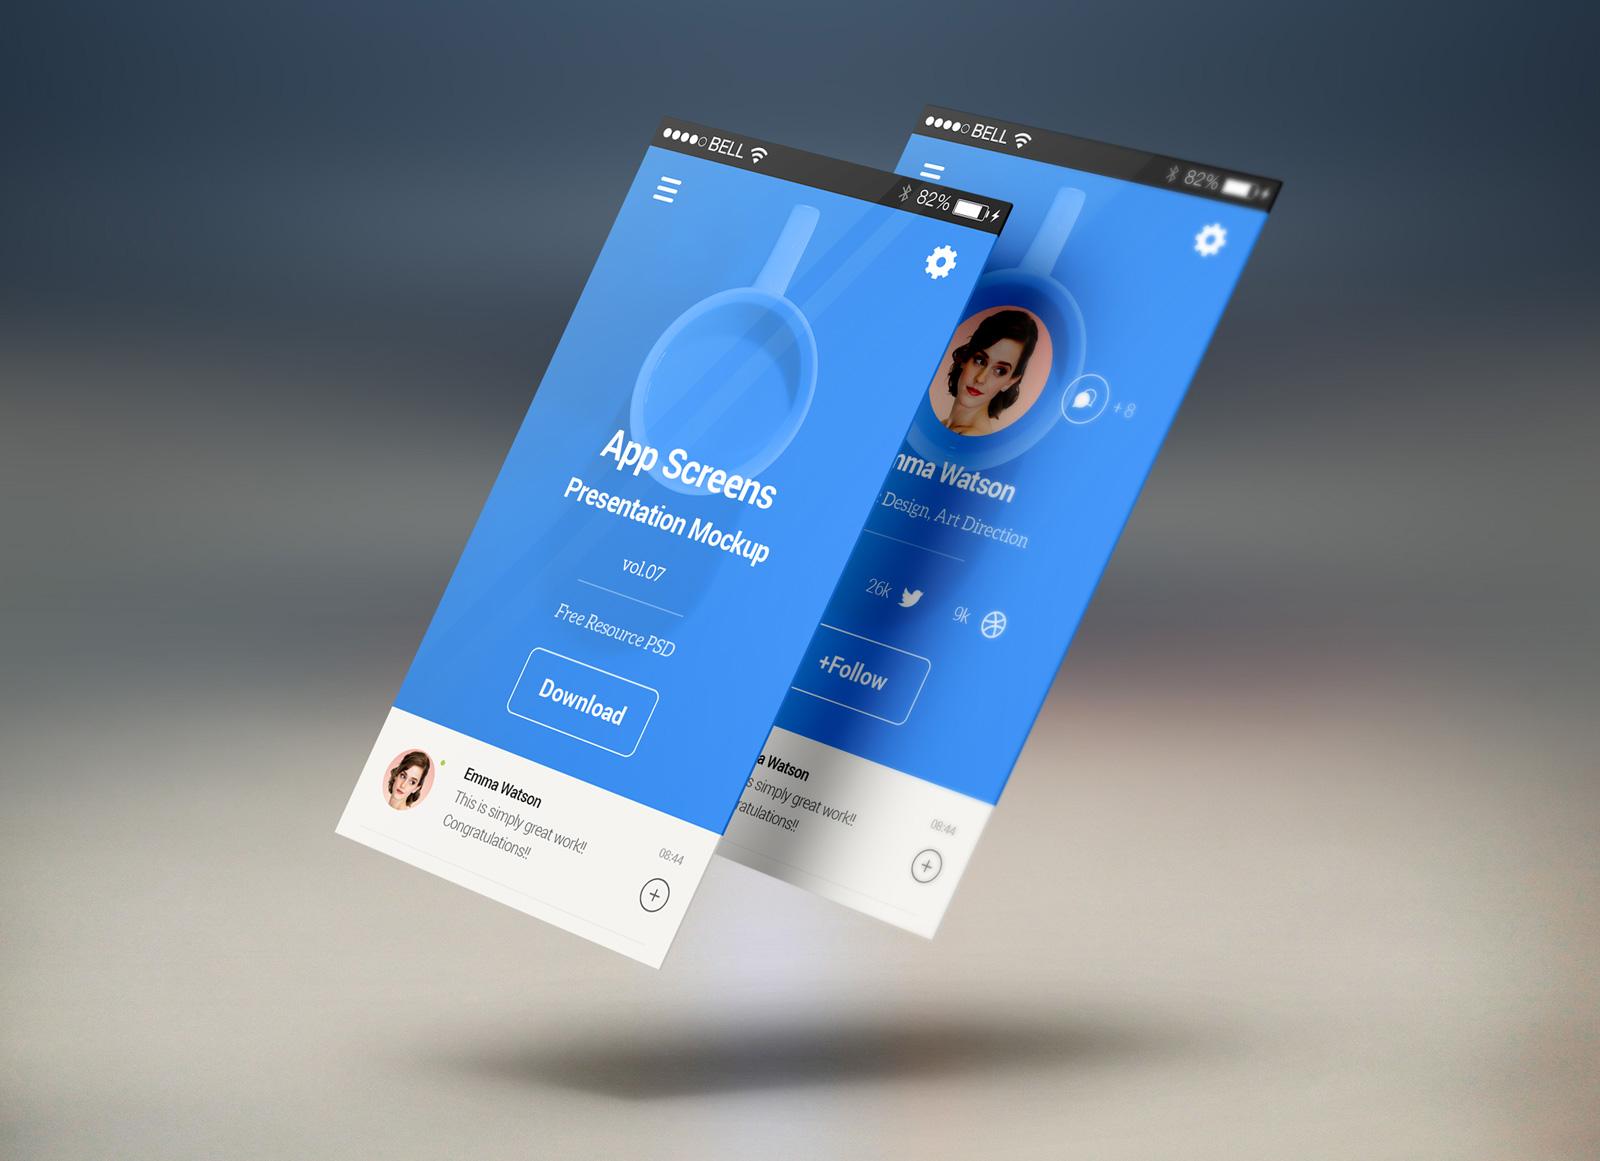 Free-Mobile-App-Screens-Presentation-Mockup-PSD